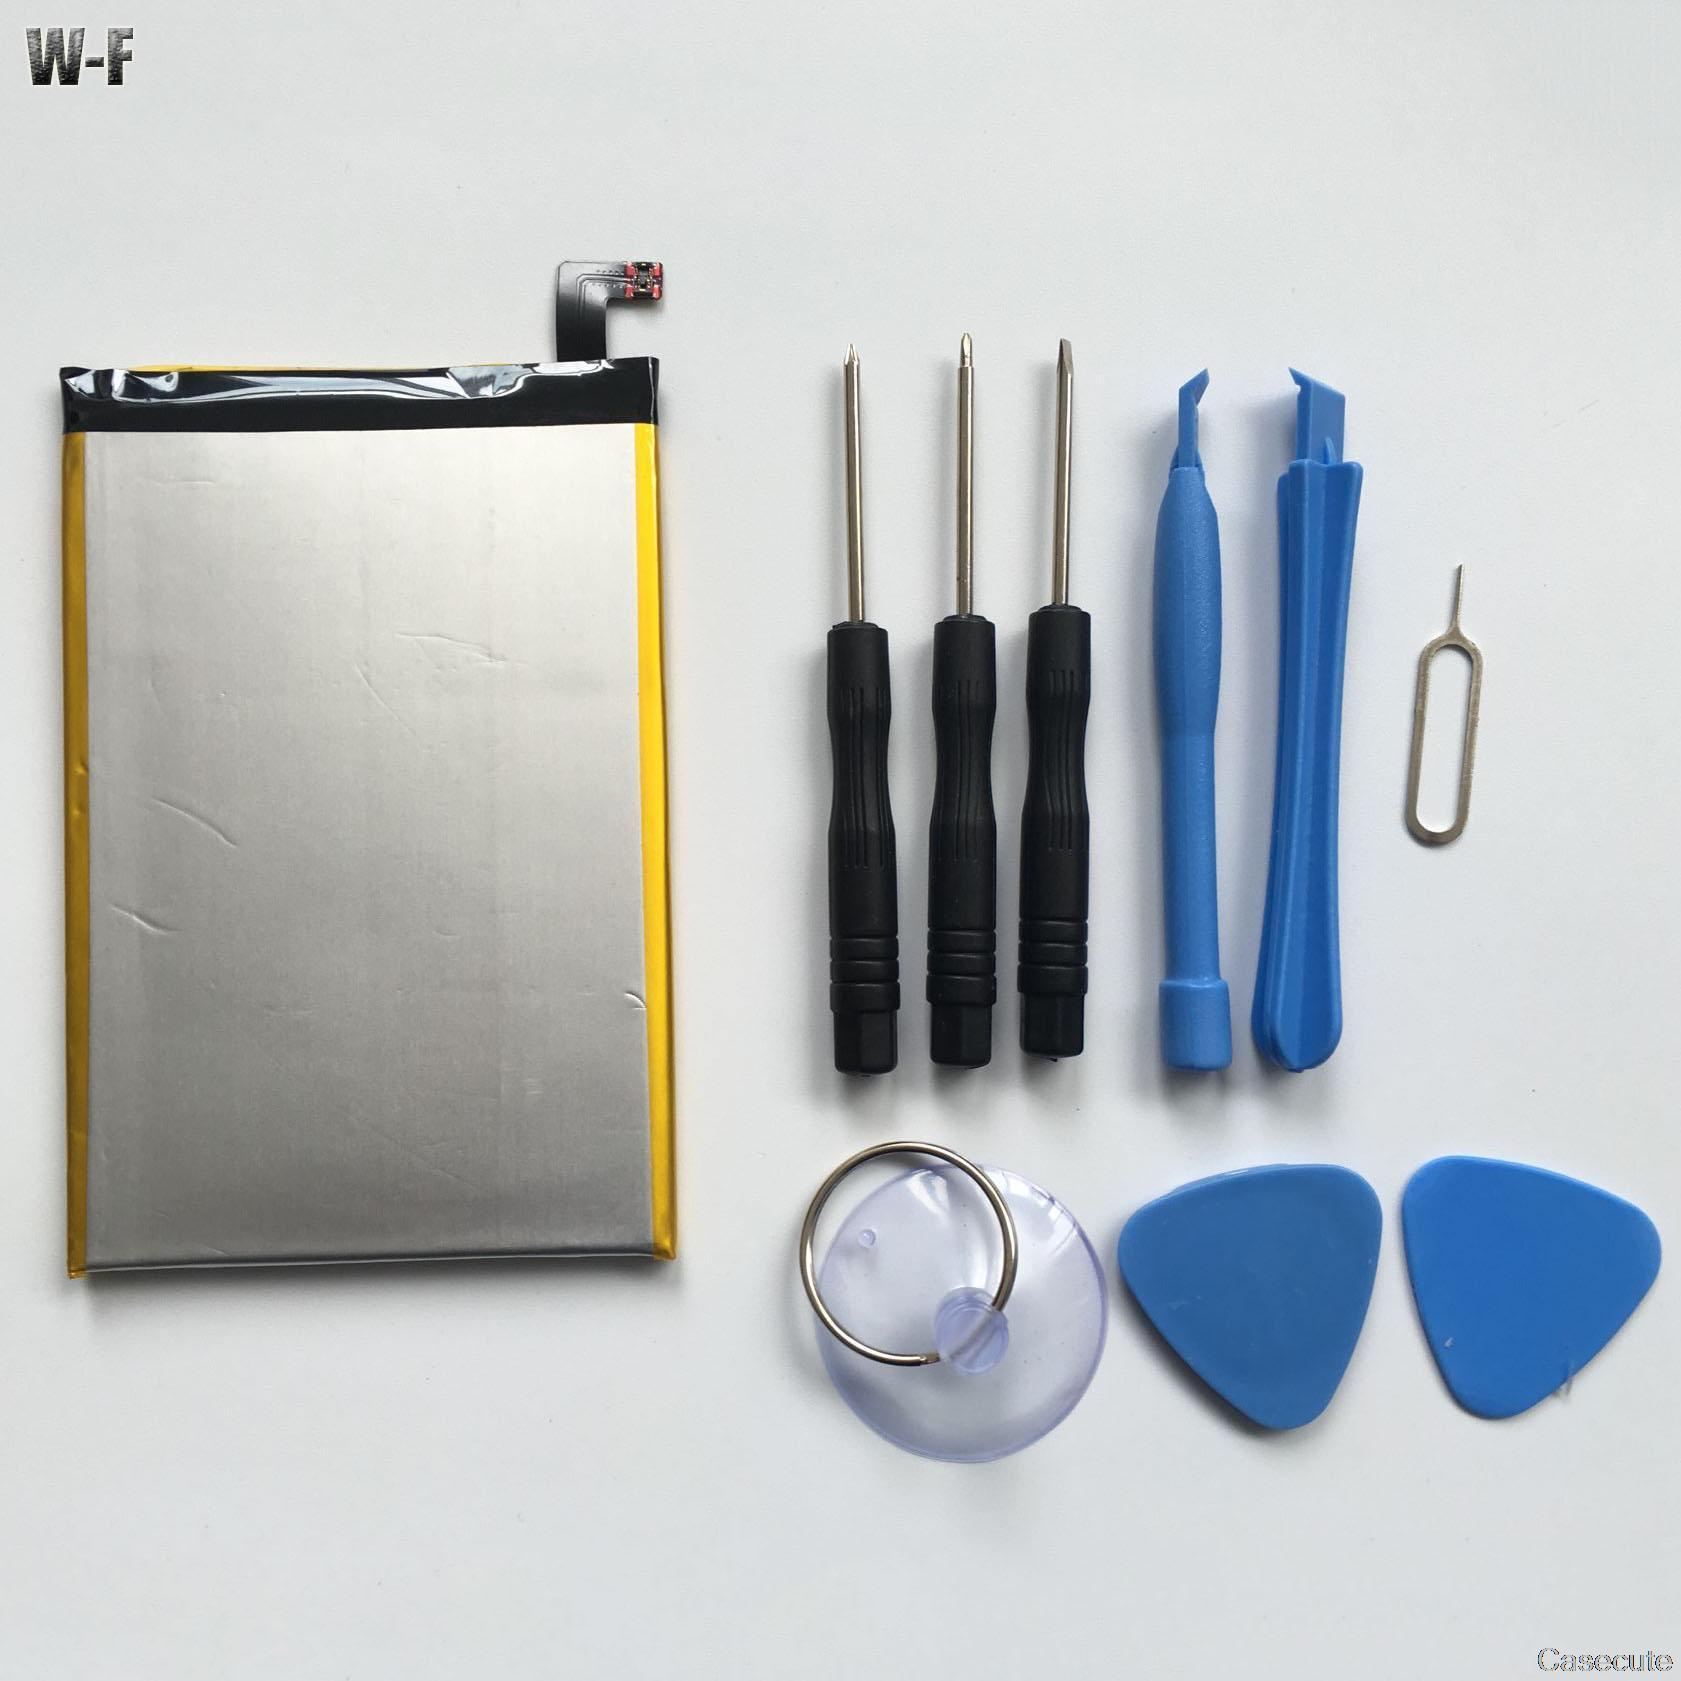 Original Leagoo Shark 1 Battery Replacement High Capacity 6300mAh Li-ION Smart Phone Parts for Leagoo Shark 1 Smart Phone(China (Mainland))